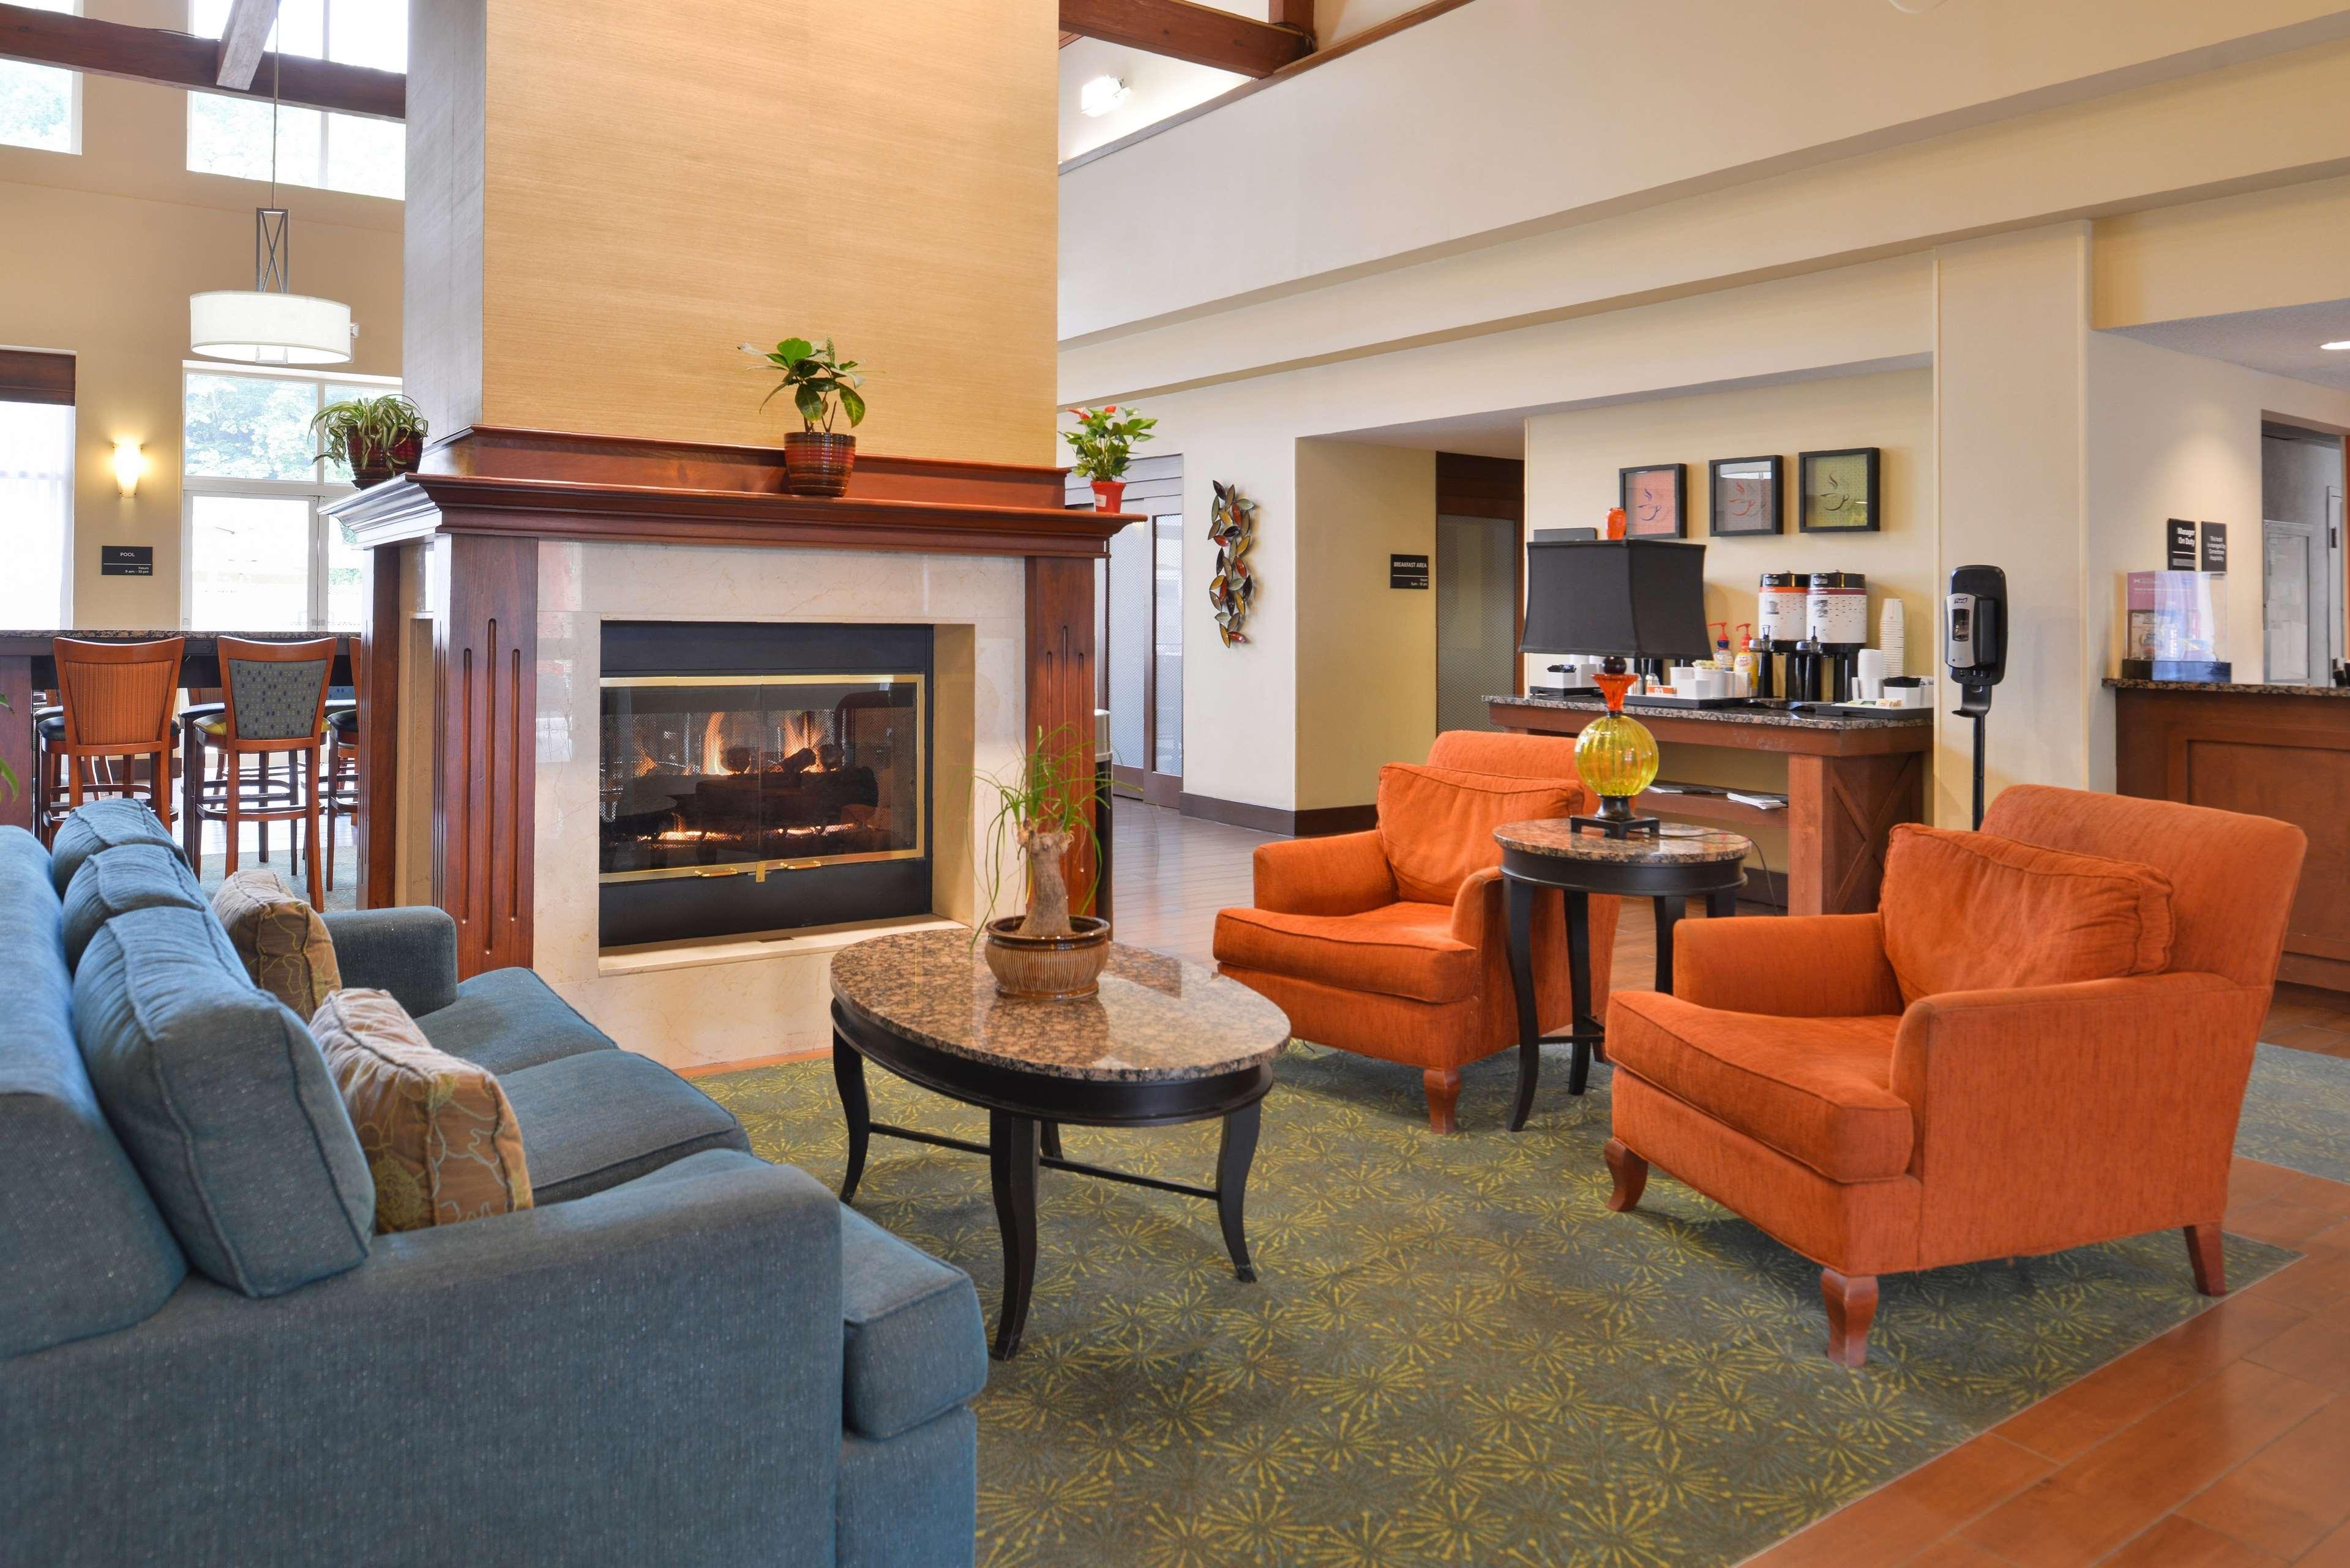 Hampton Inn & Suites Newport News (Oyster Point) image 5